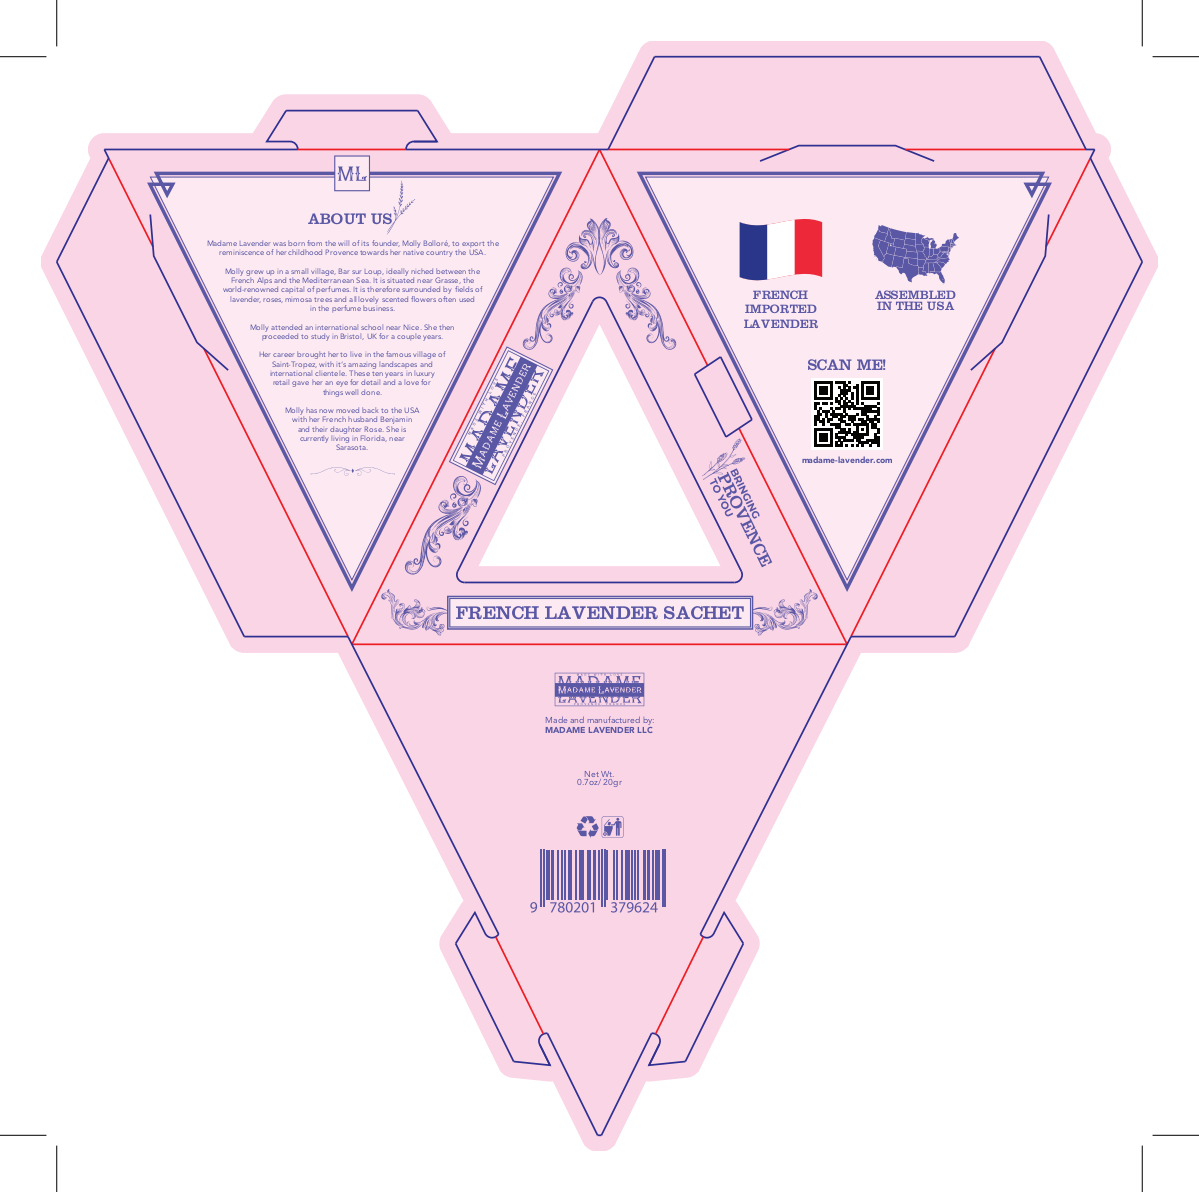 Packaging design for french lavender sachets & soaps